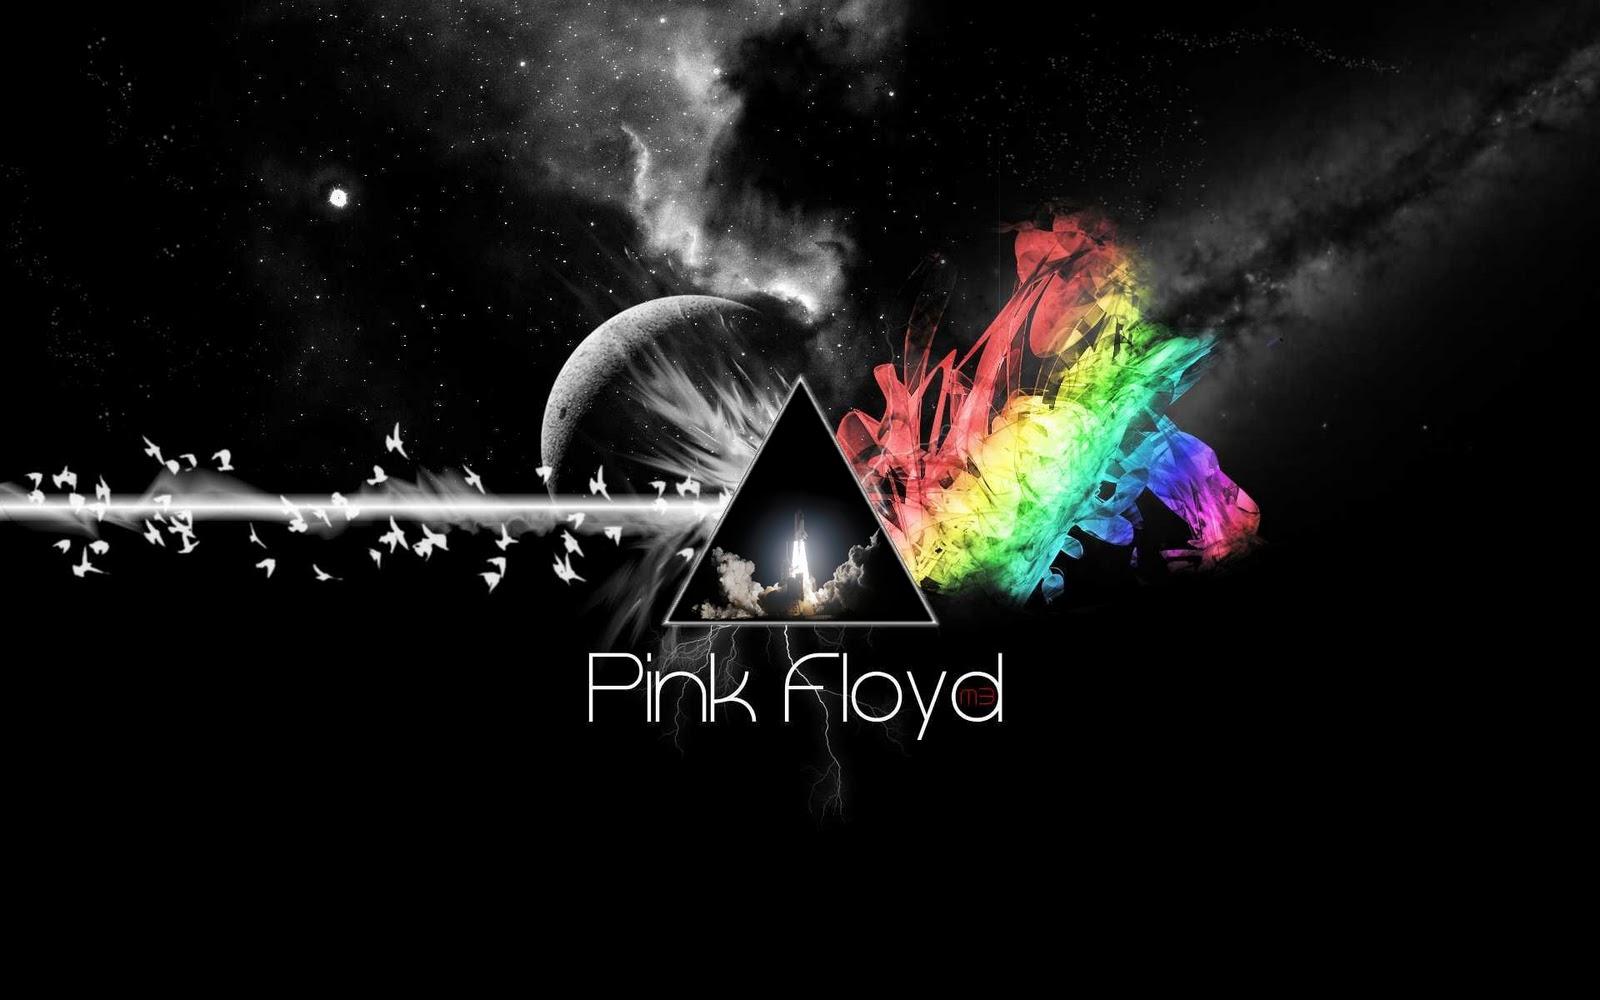 http://1.bp.blogspot.com/-h6lDPhBpenY/TY9E5I-jZ7I/AAAAAAAAADU/fj4yA370cik/s1600/Pink_Floyd_wallpaper_13.jpg